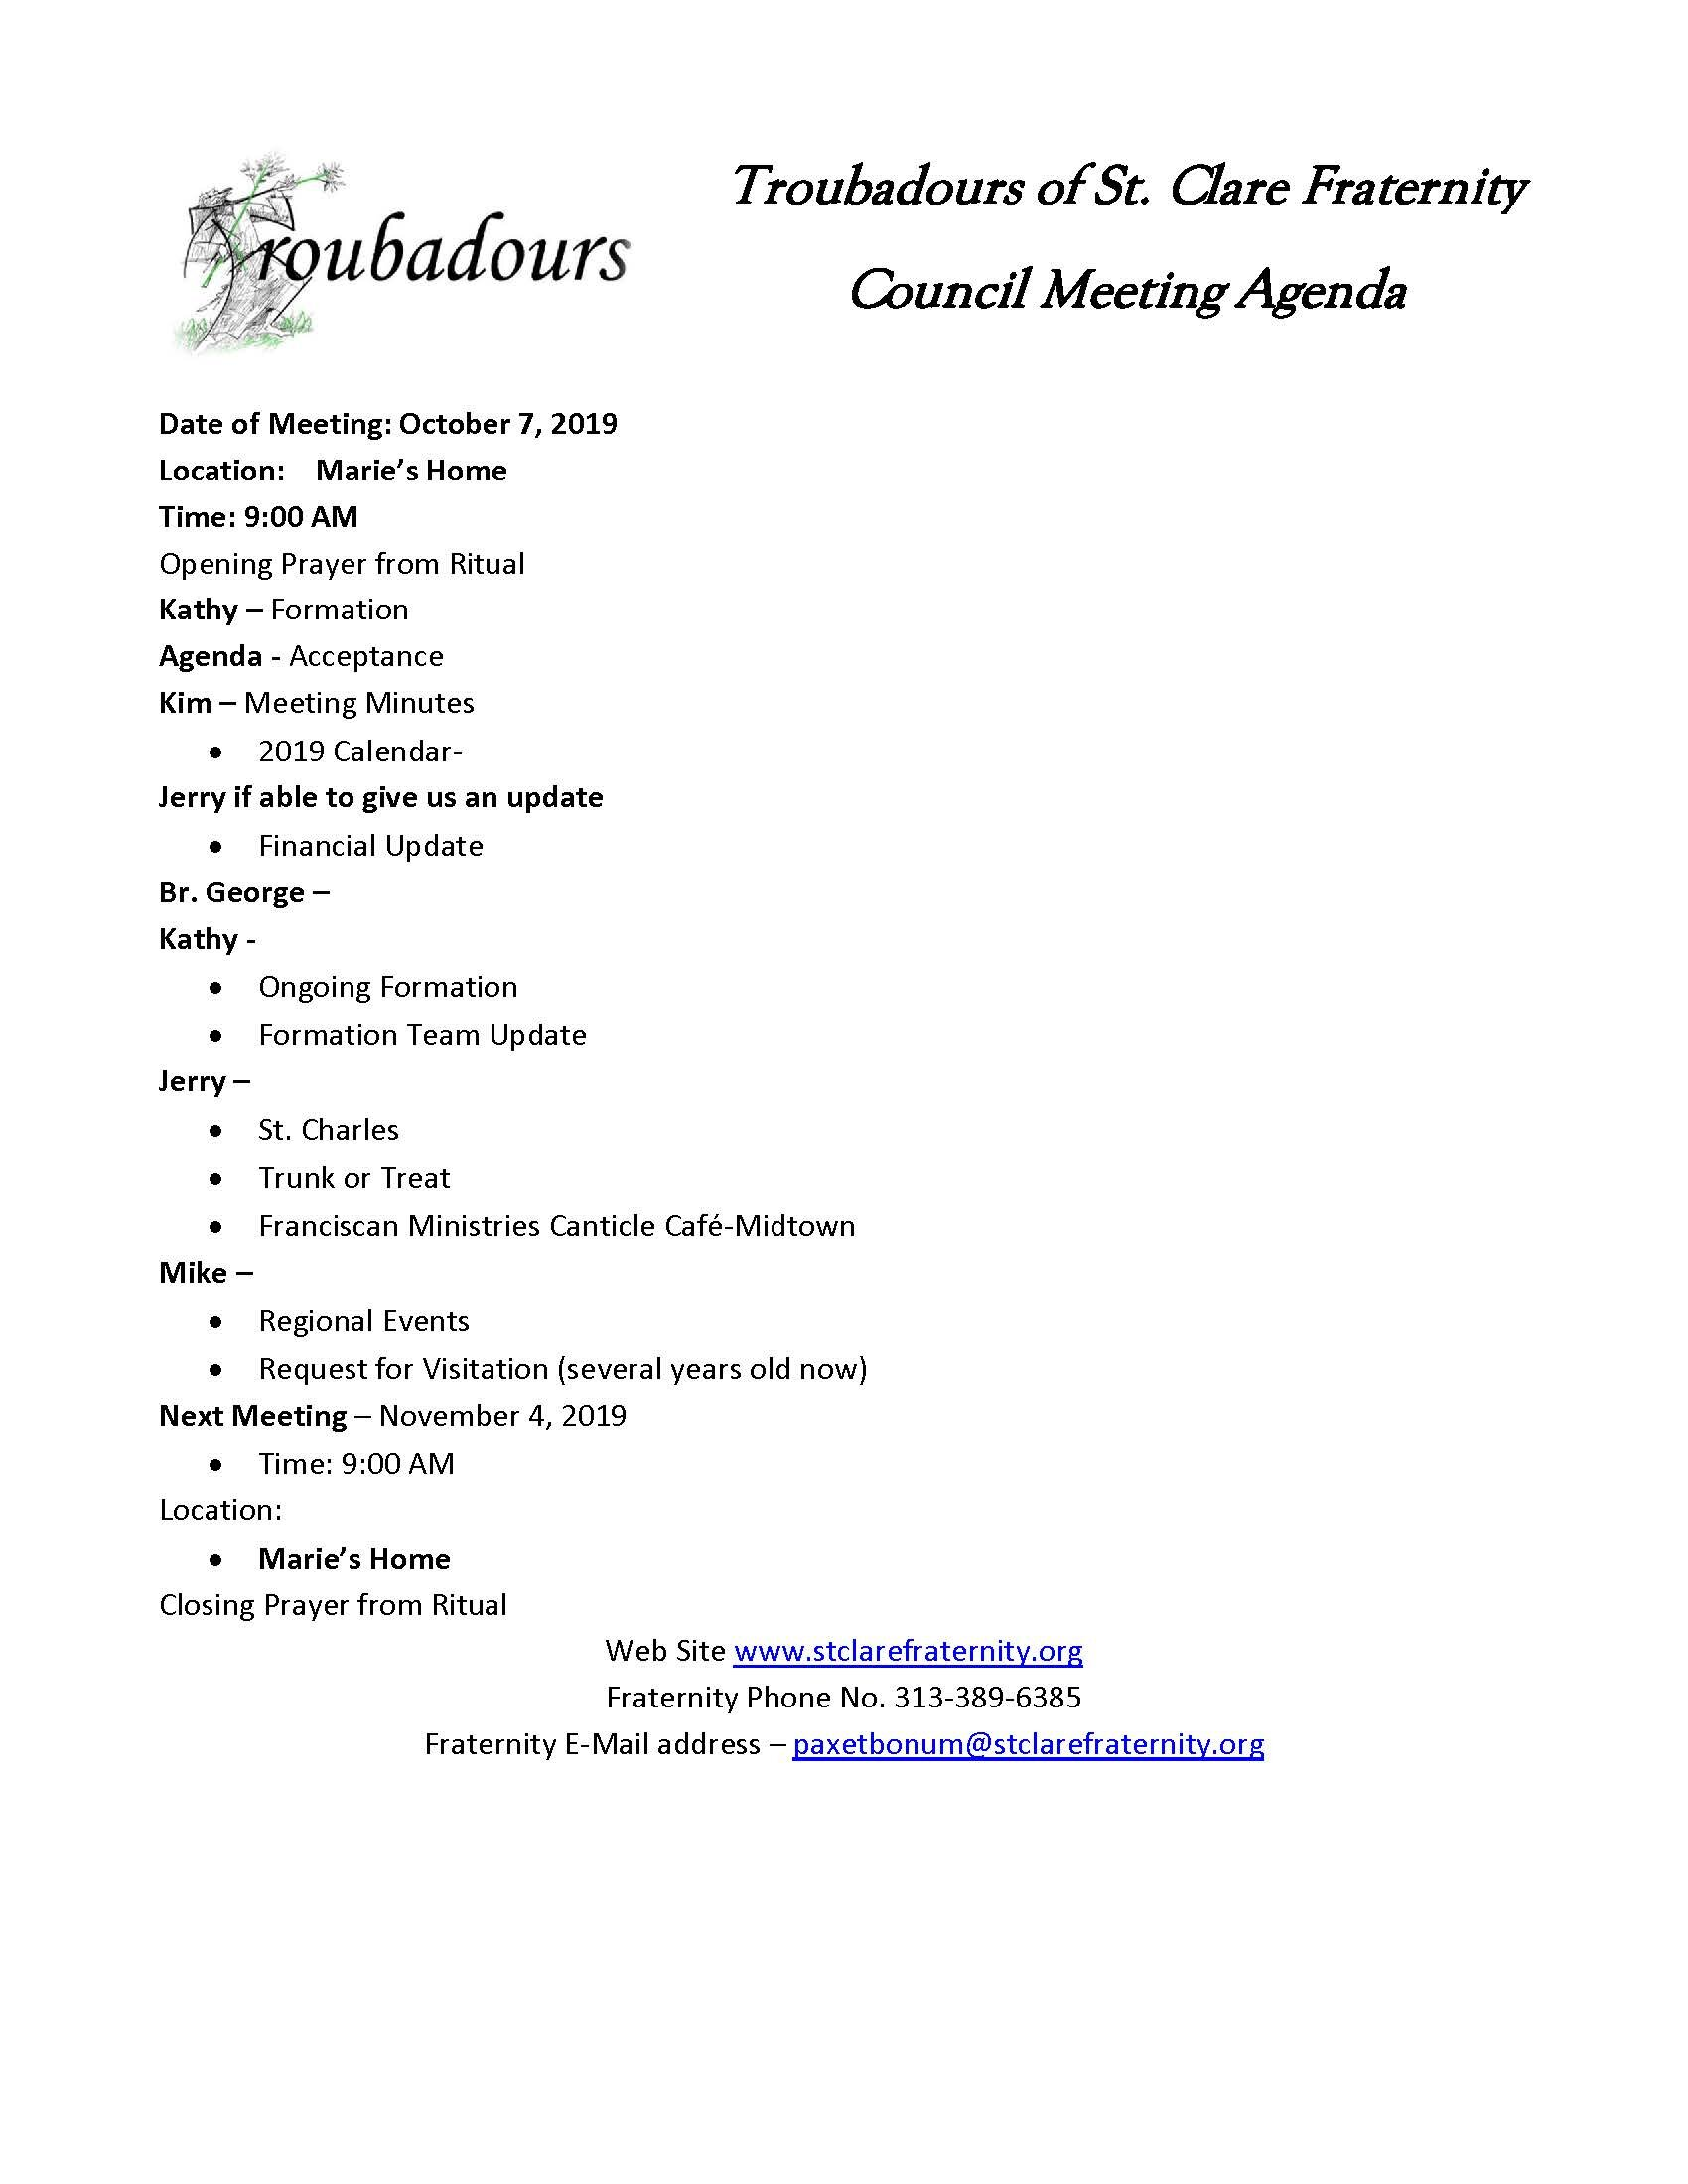 10-7-2019 Council Meeting Agenda.jpg